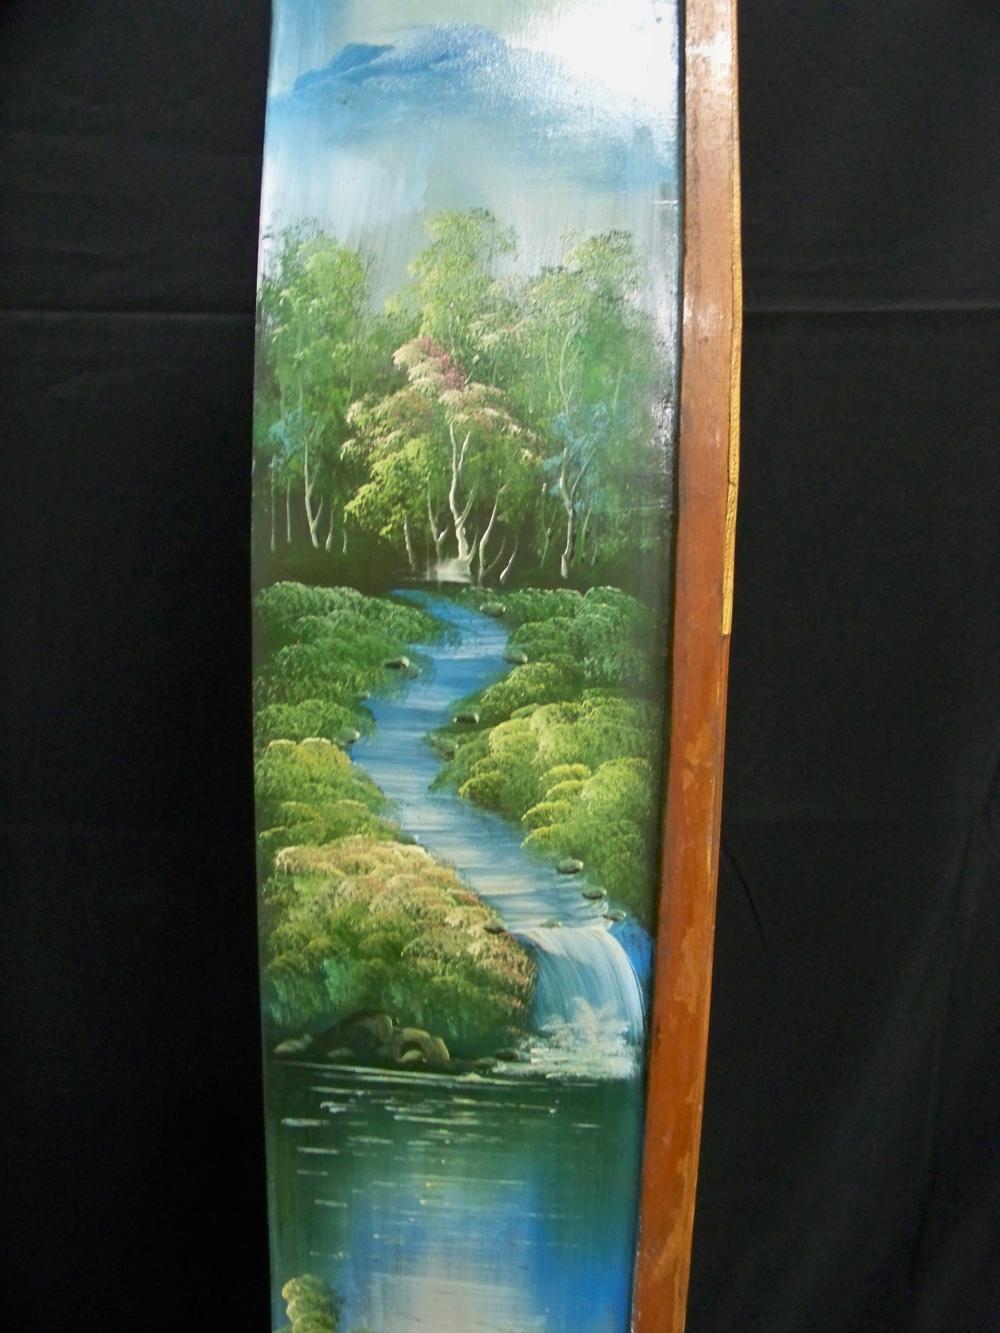 Decorative Painted Wooden Row Boat Bookshelf